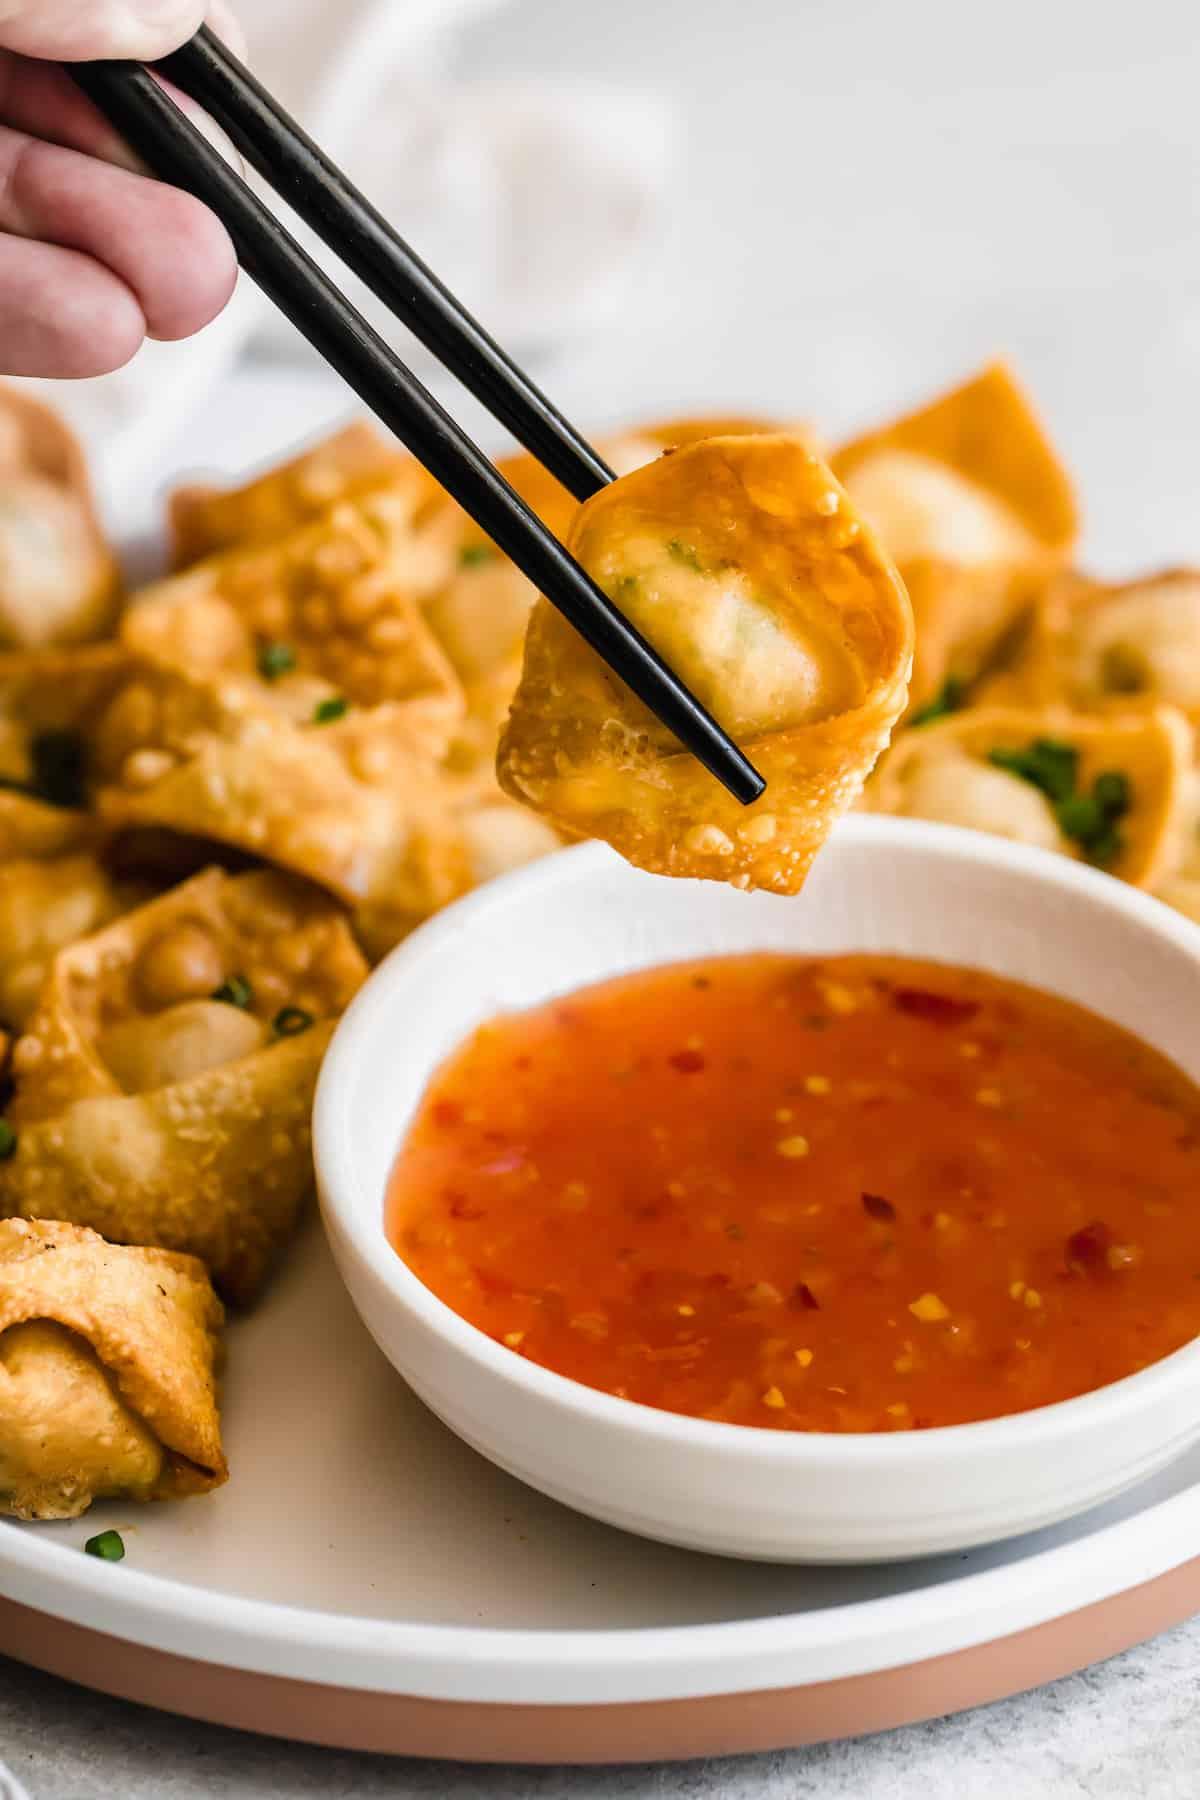 holding chopsticks and dipping crab rangoon wonton in dipping sauce